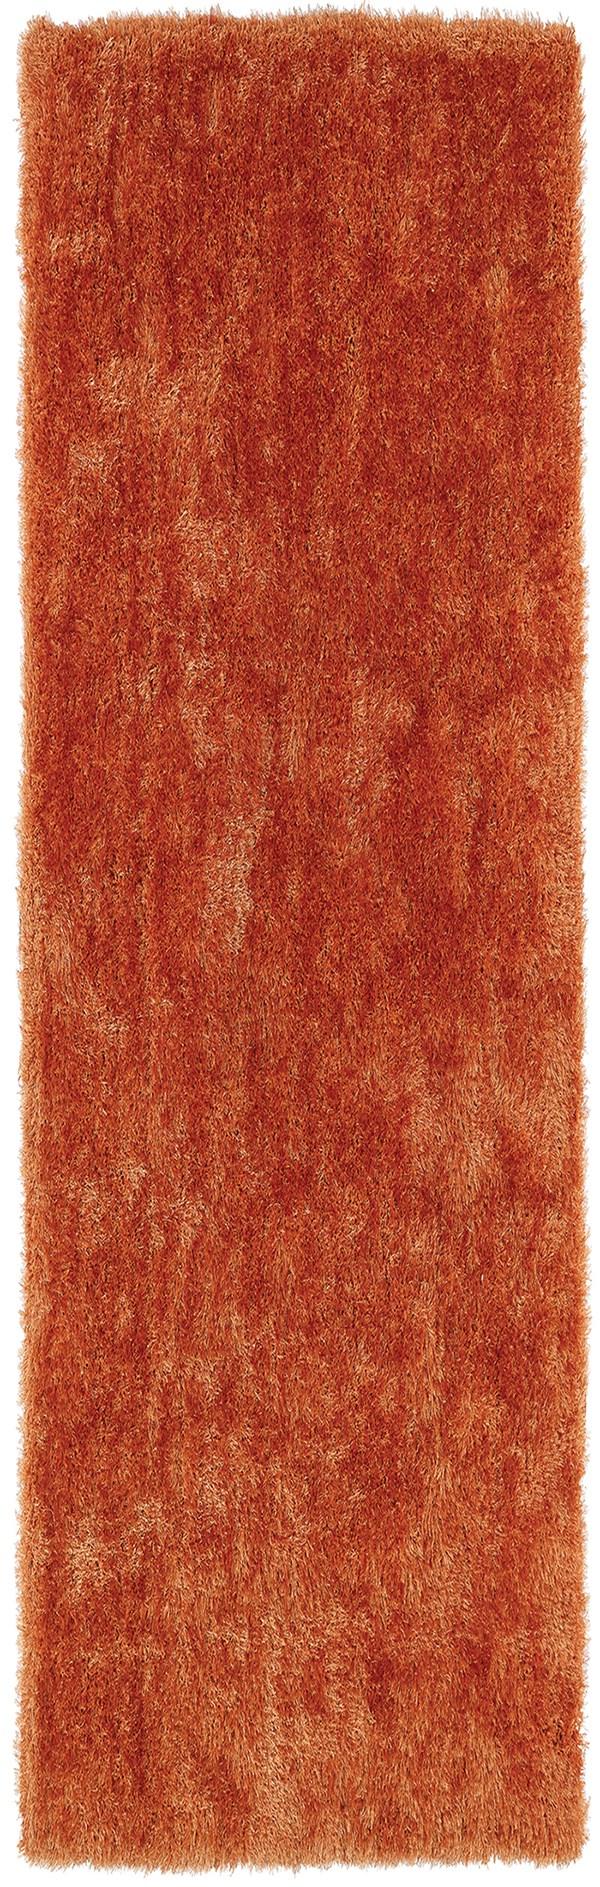 Orange (89) Solid Area Rug